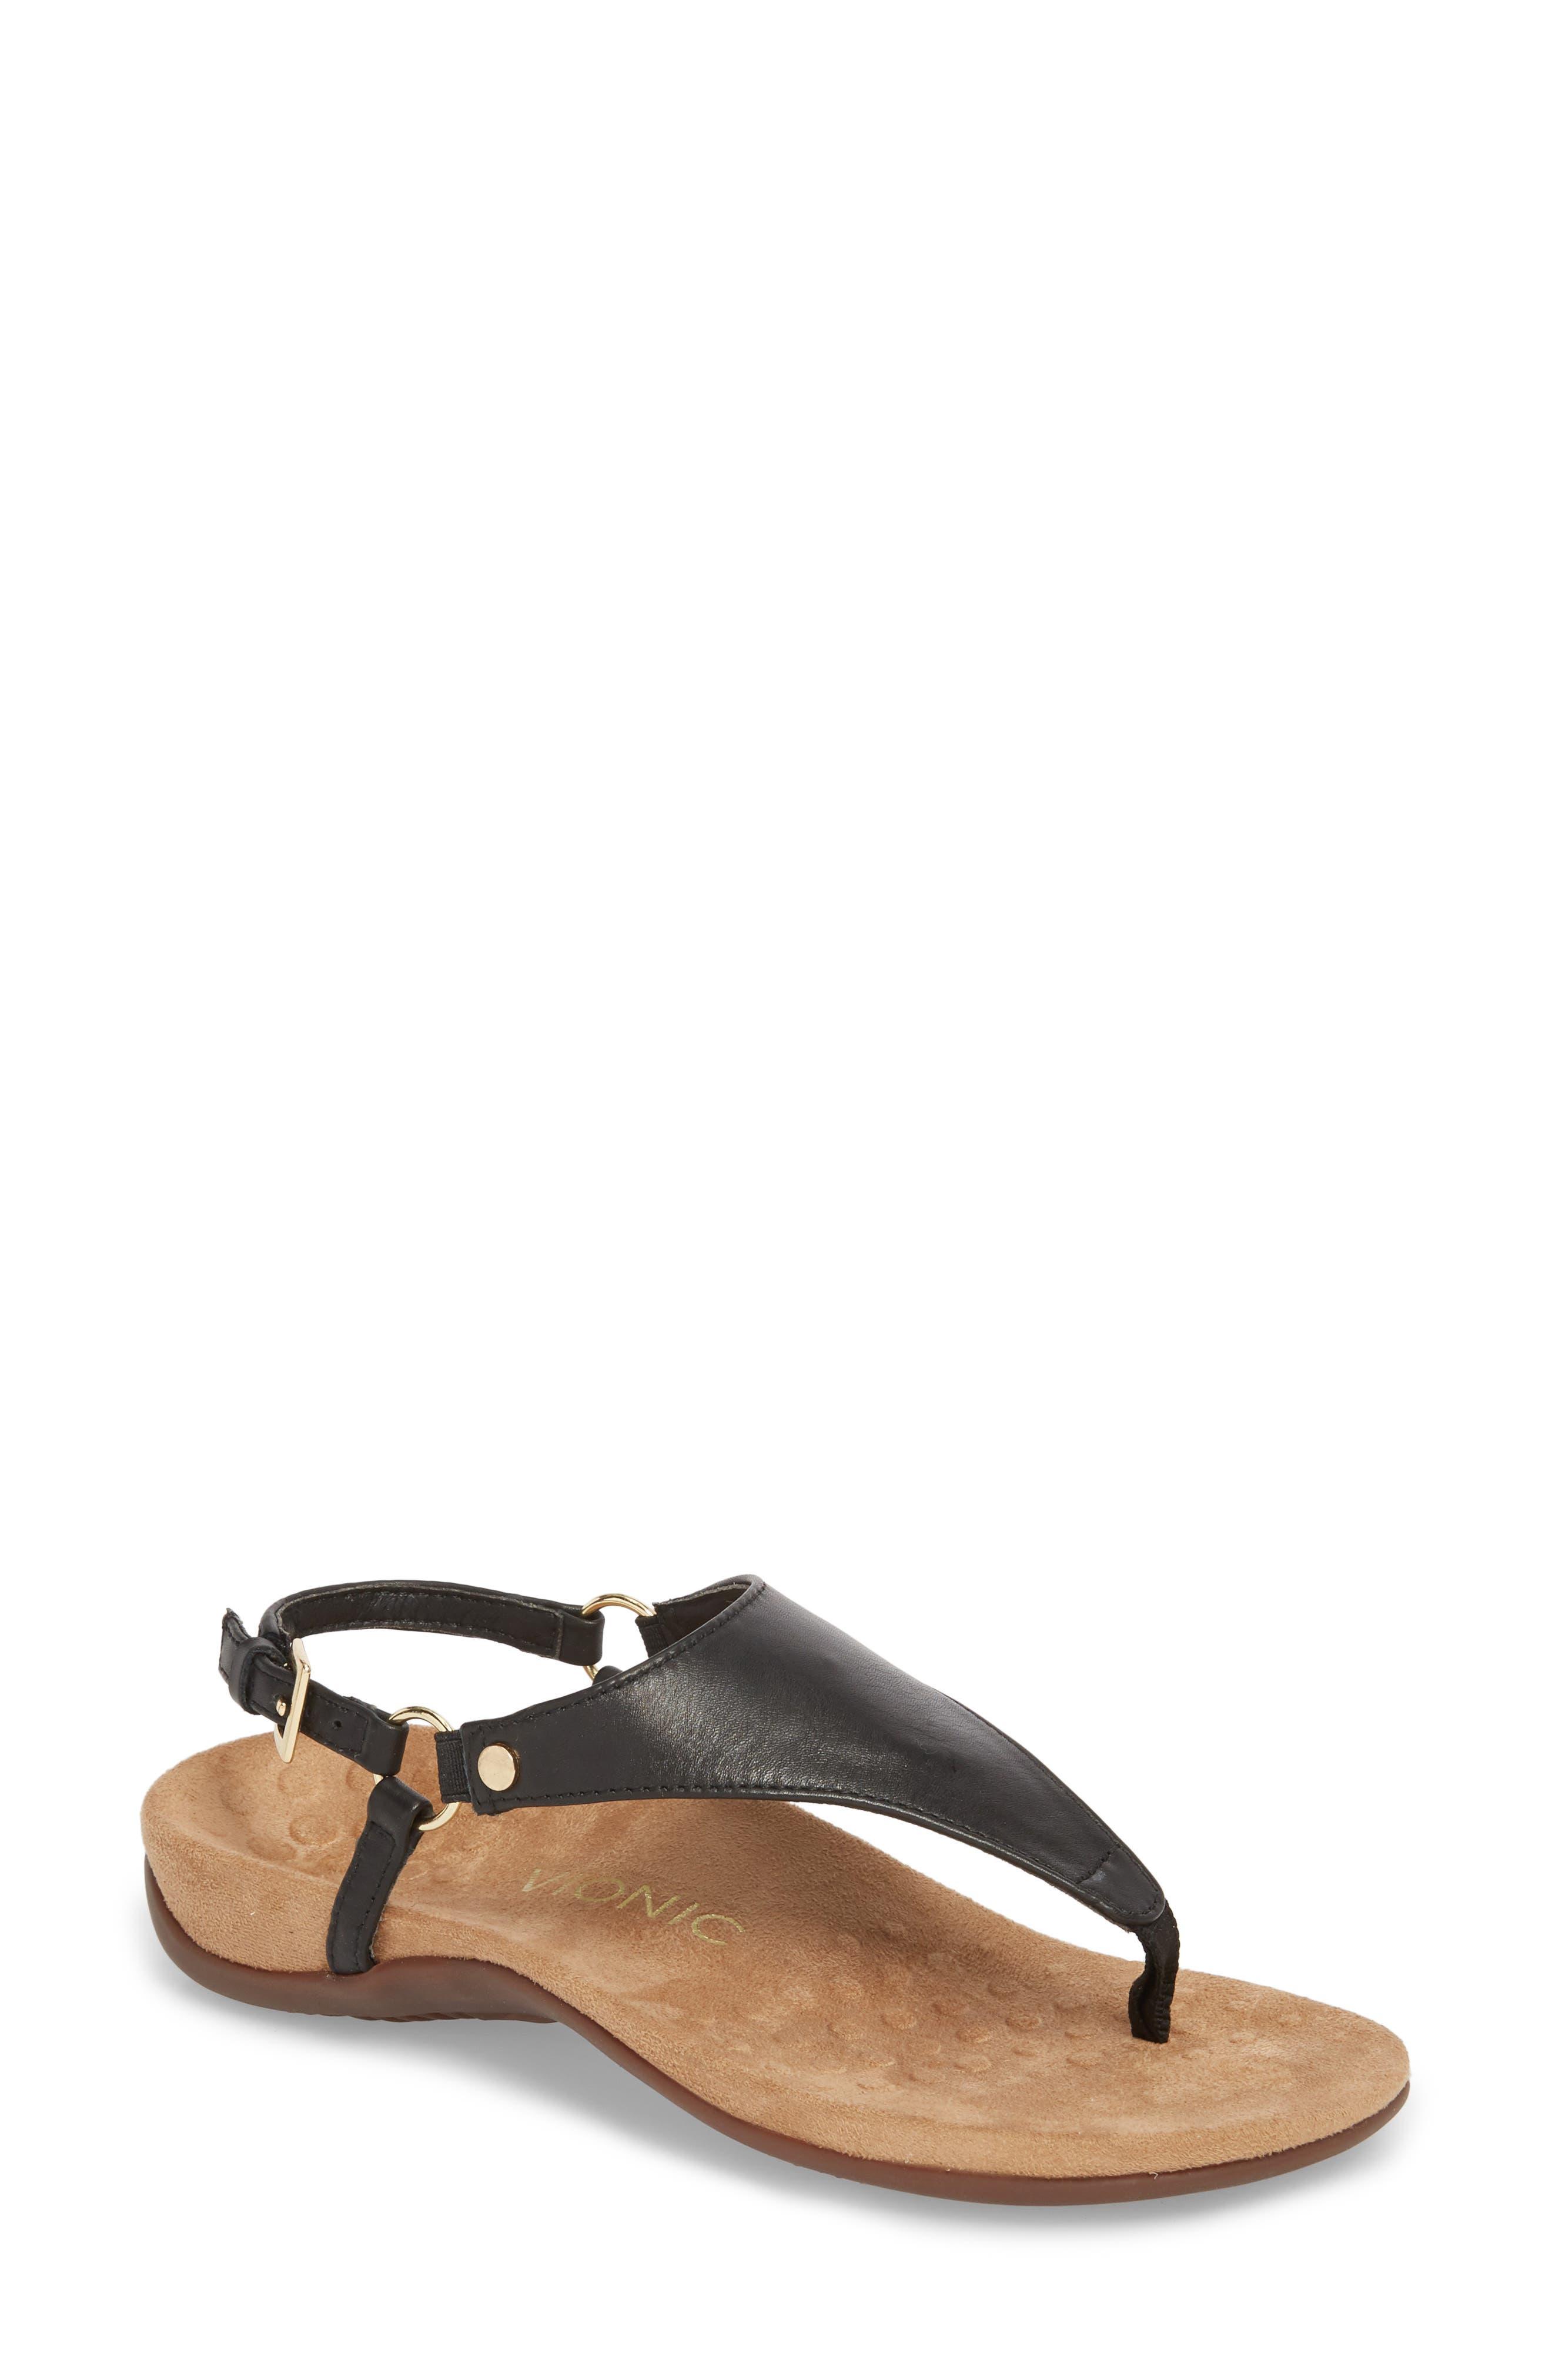 Kirra Orthaheel<sup>®</sup> Sandal,                         Main,                         color, Black Leather